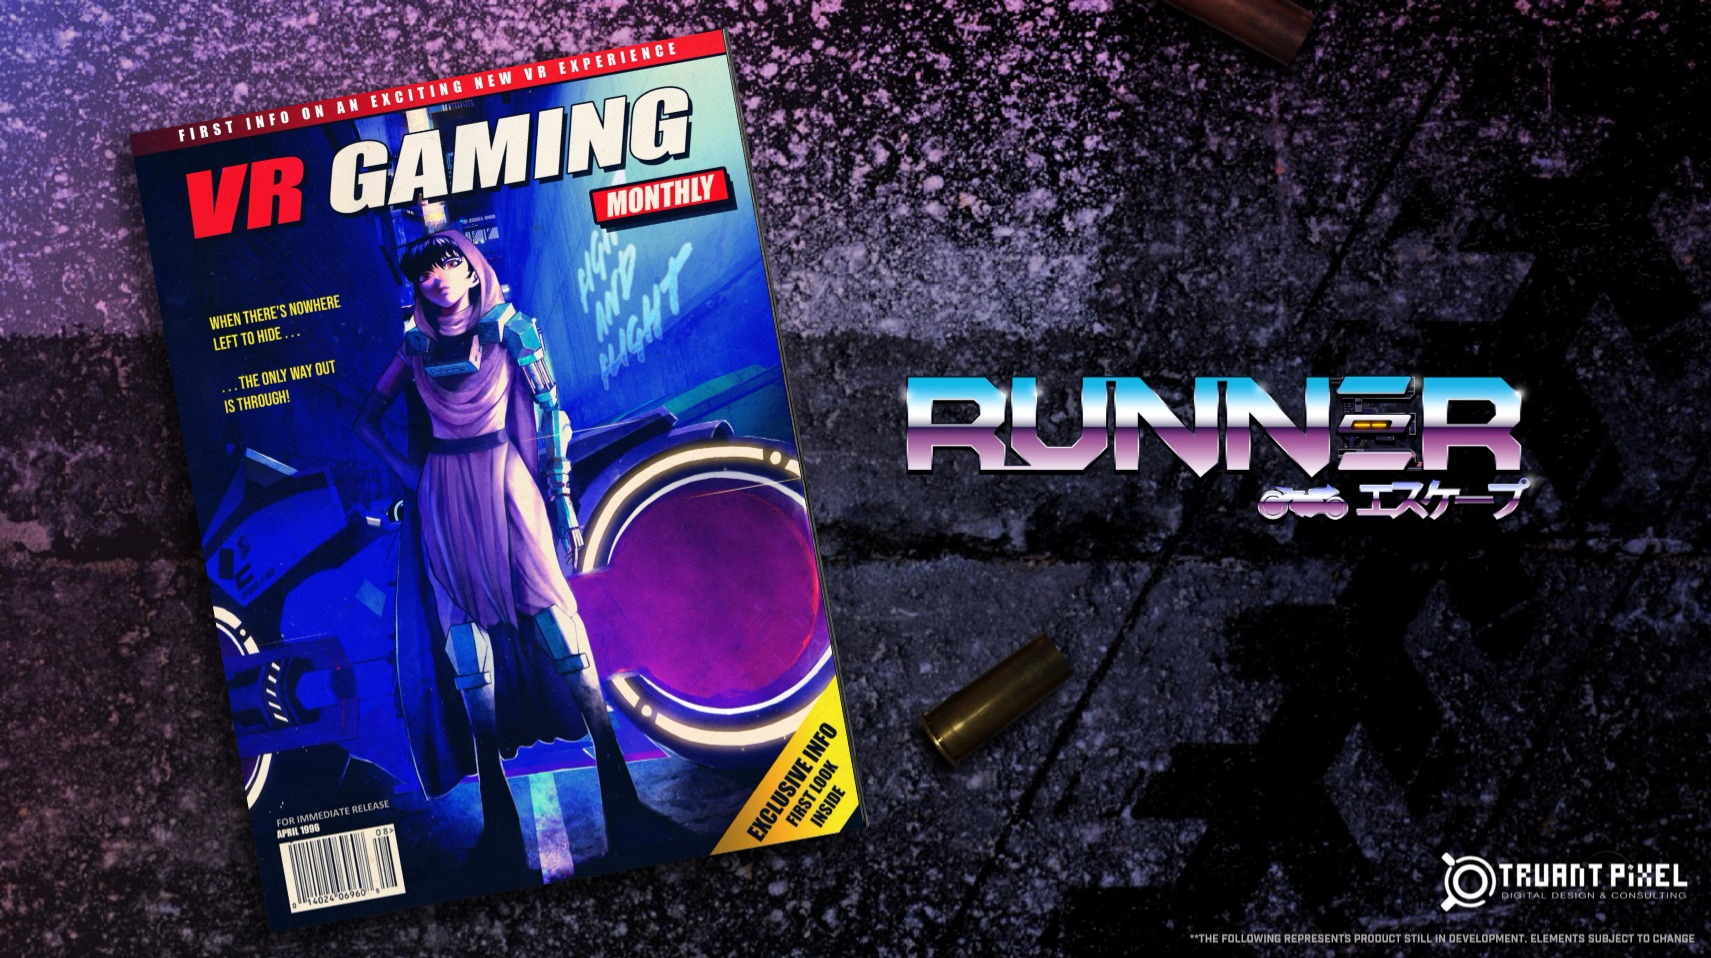 80年代动画风格的VR竞速游戏《Runner》将登陆PS VR 2